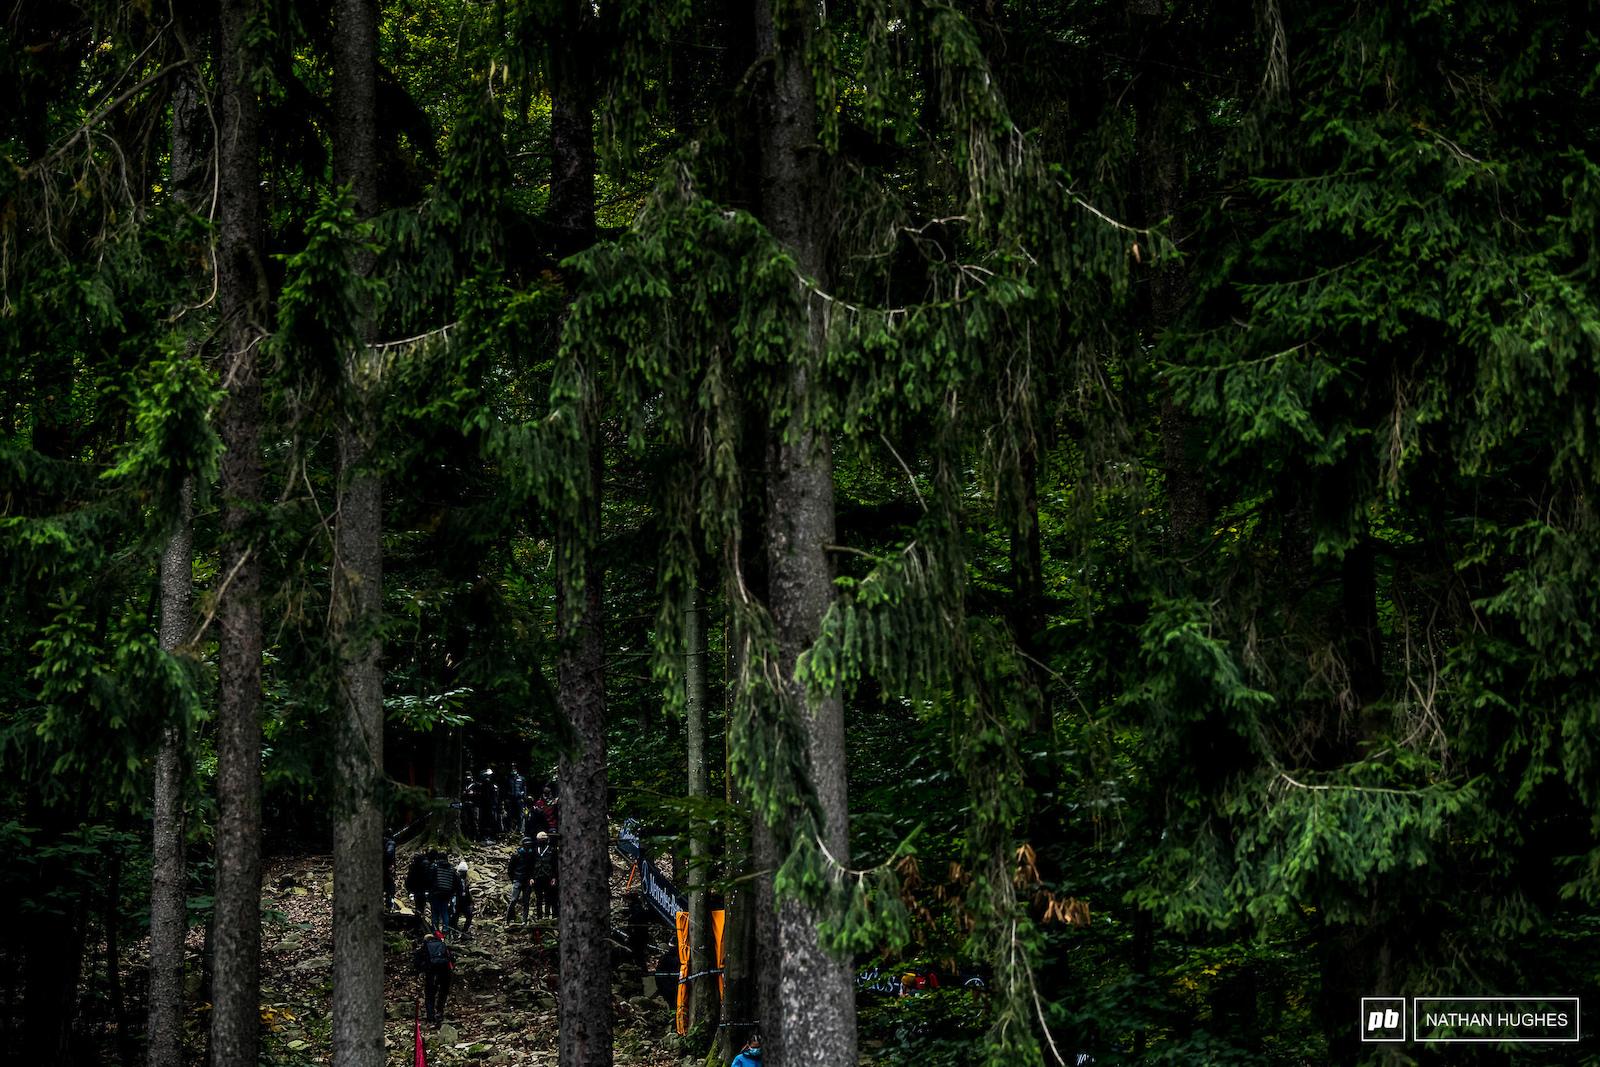 The deep woods.